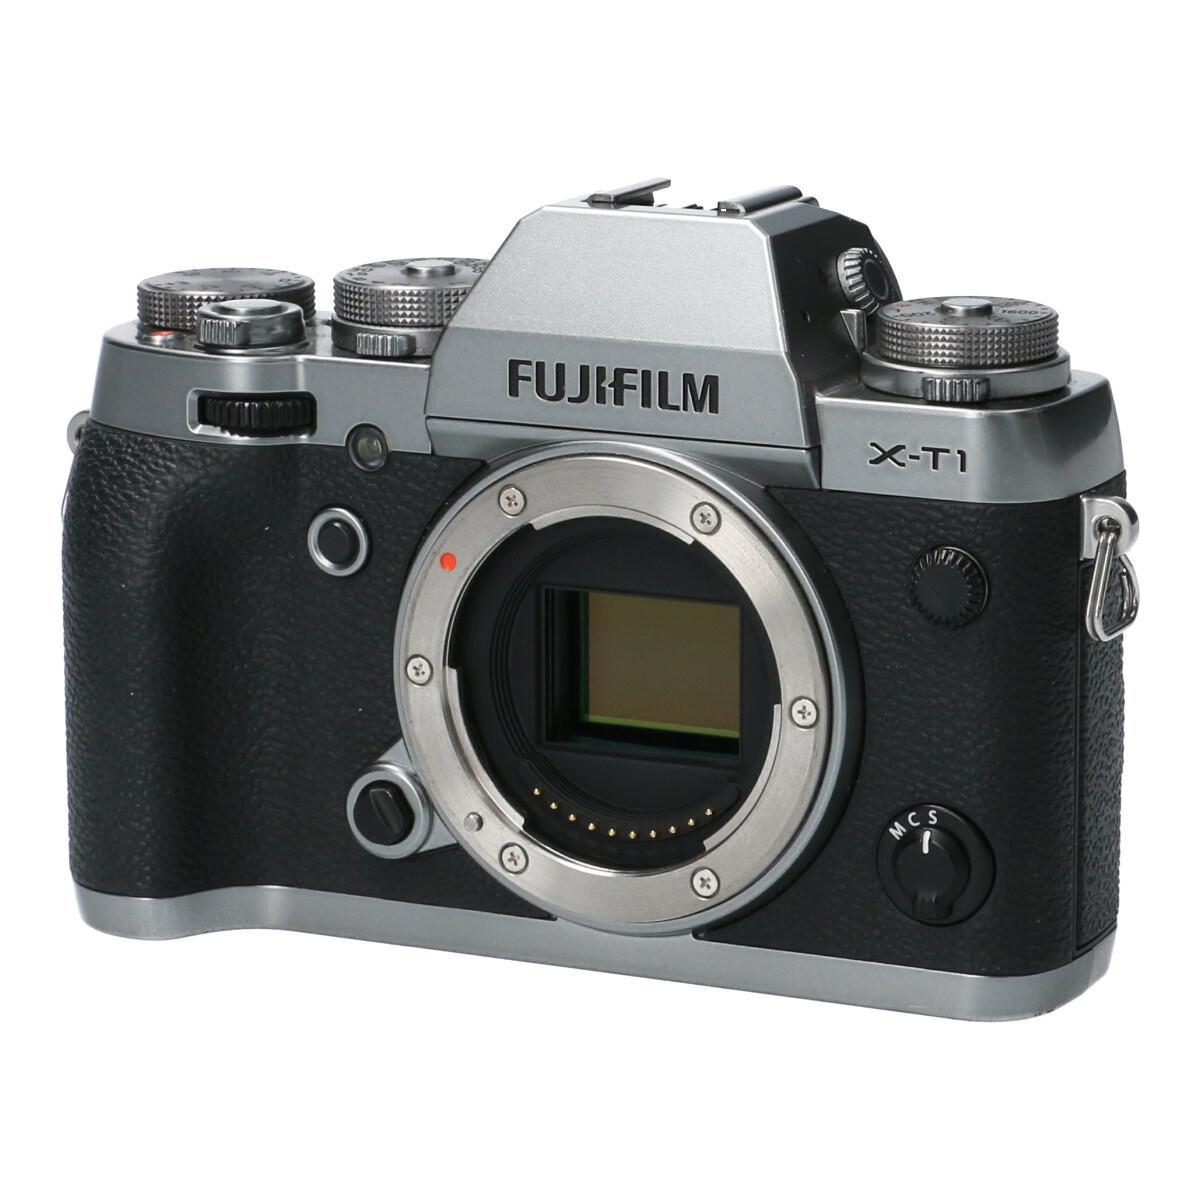 FUJIFILM X-T1グラファイトシルバー【中古】